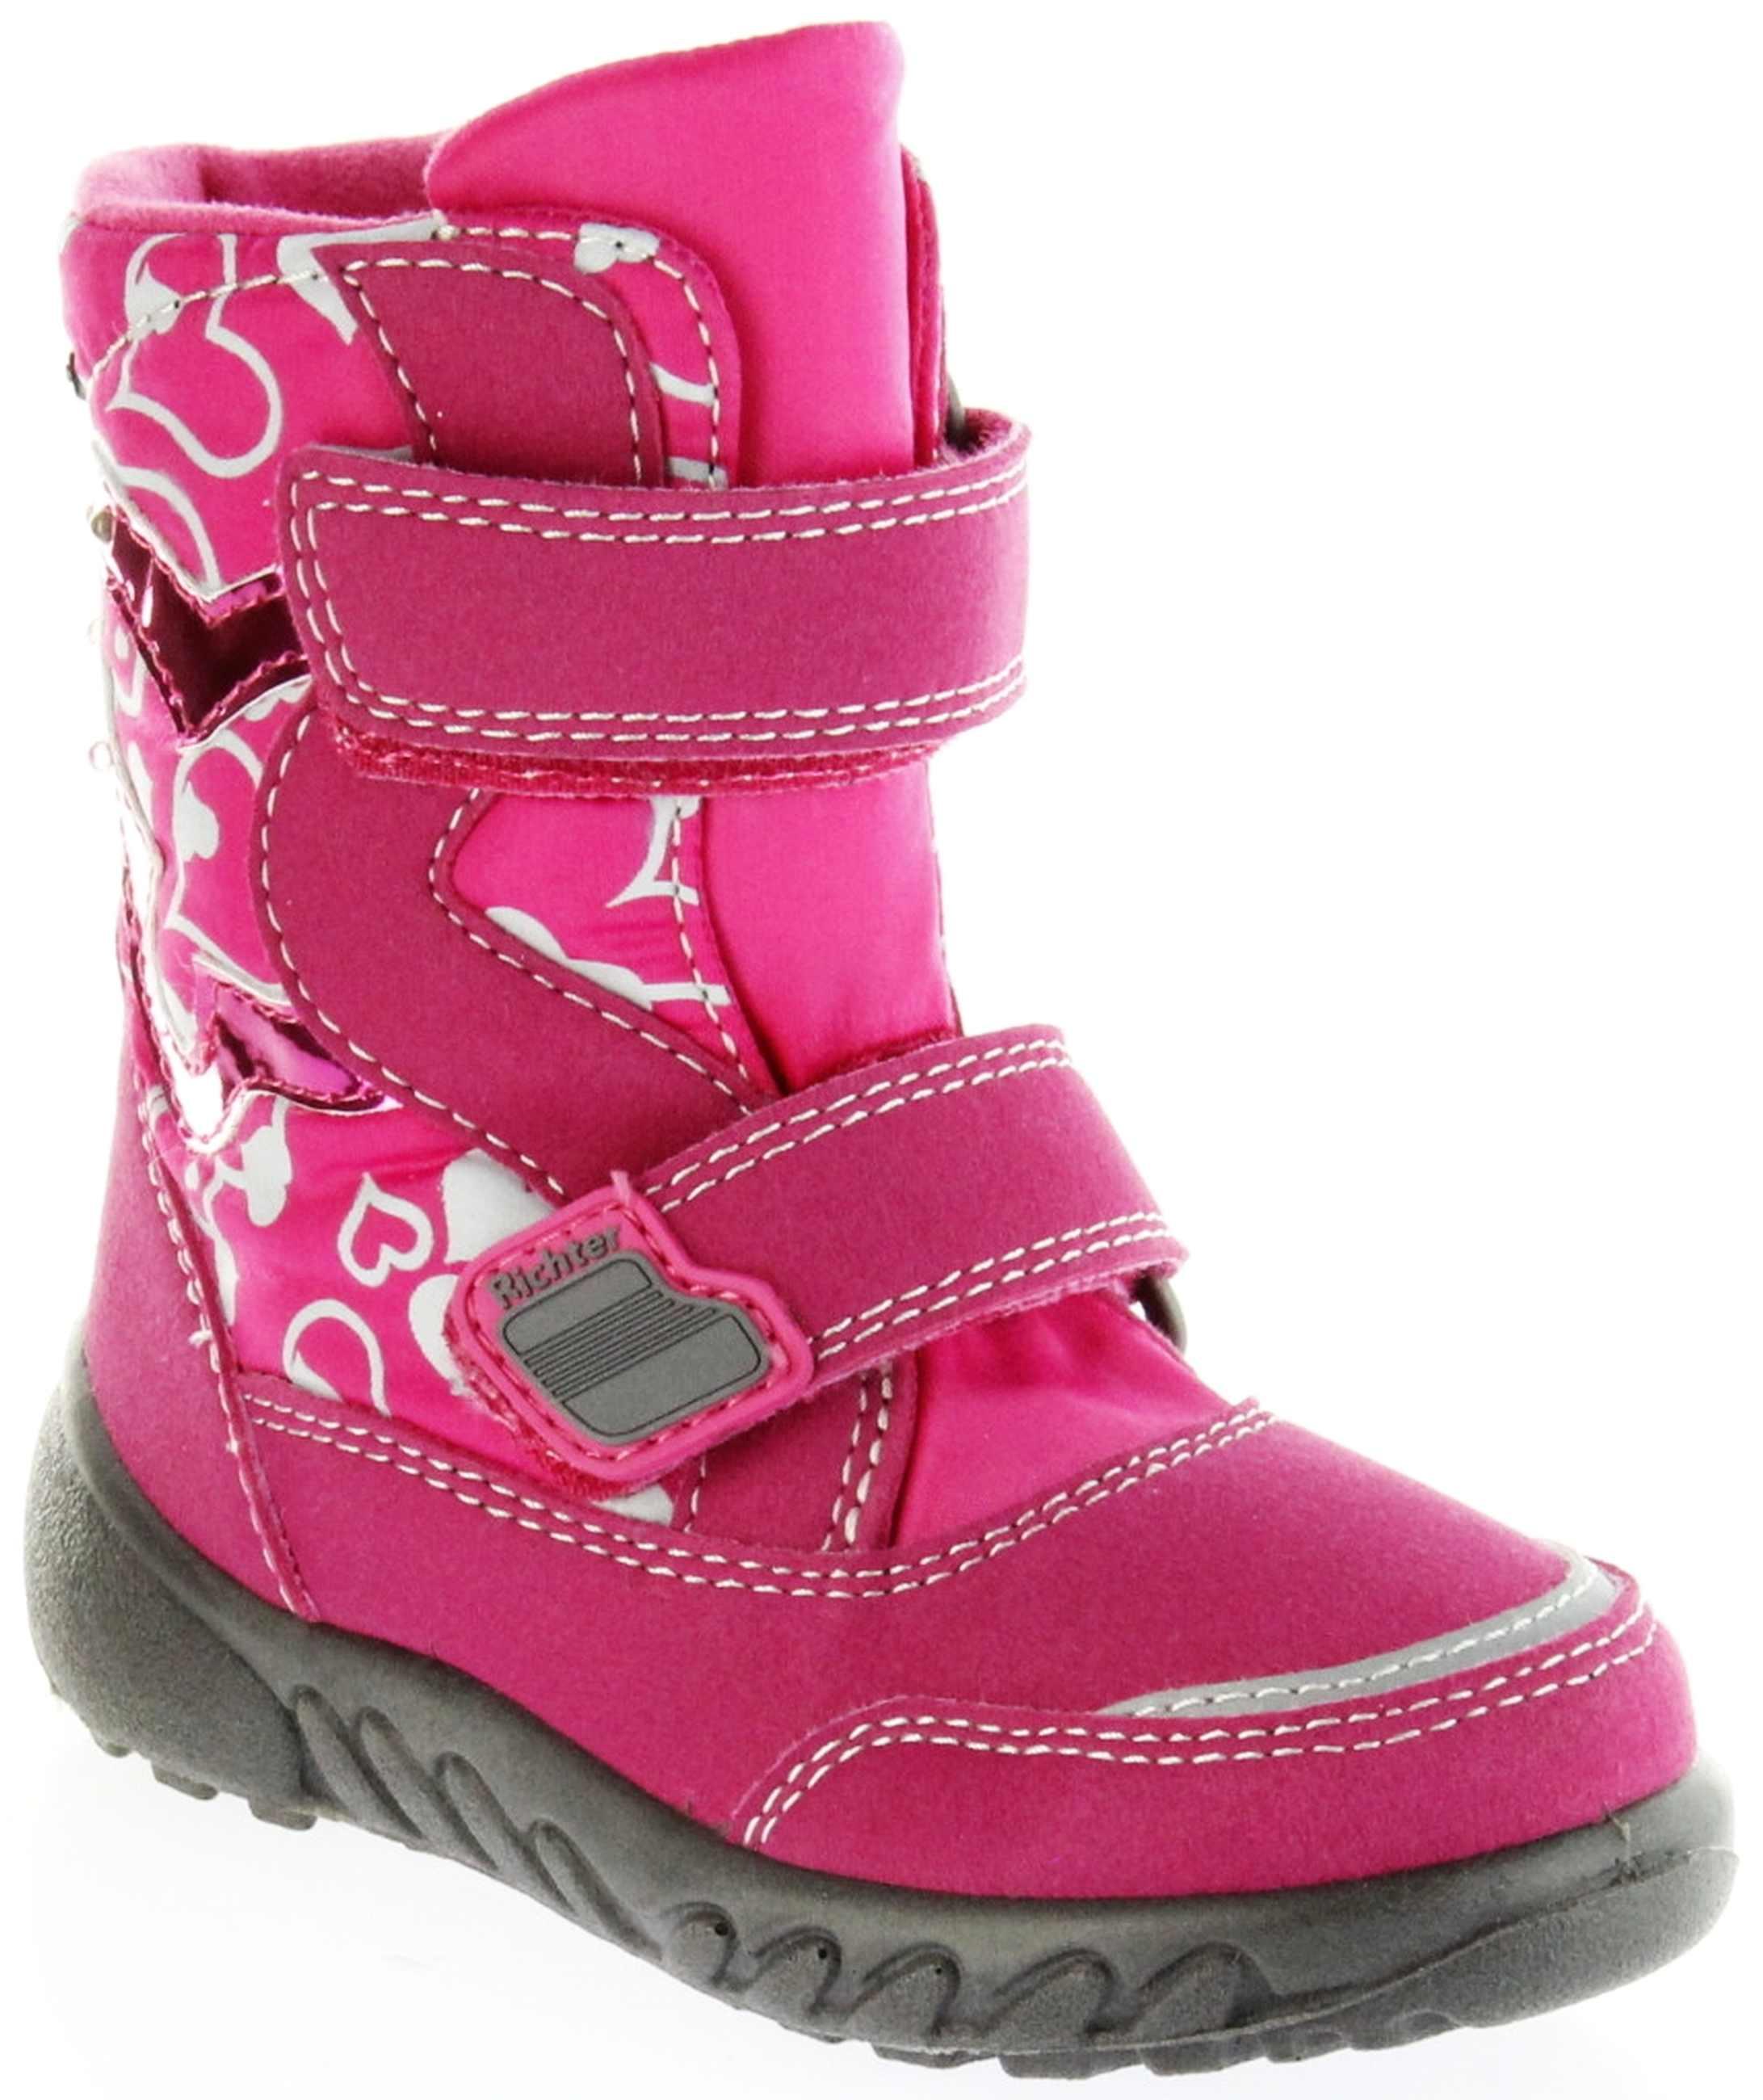 sports shoes 53fc4 0303a Richter Kinder Winter Boots Stiefel pink Warmfutter SympaTex Mädchen  Blinkie WMS 5137-241-3500 fuchsia Husky